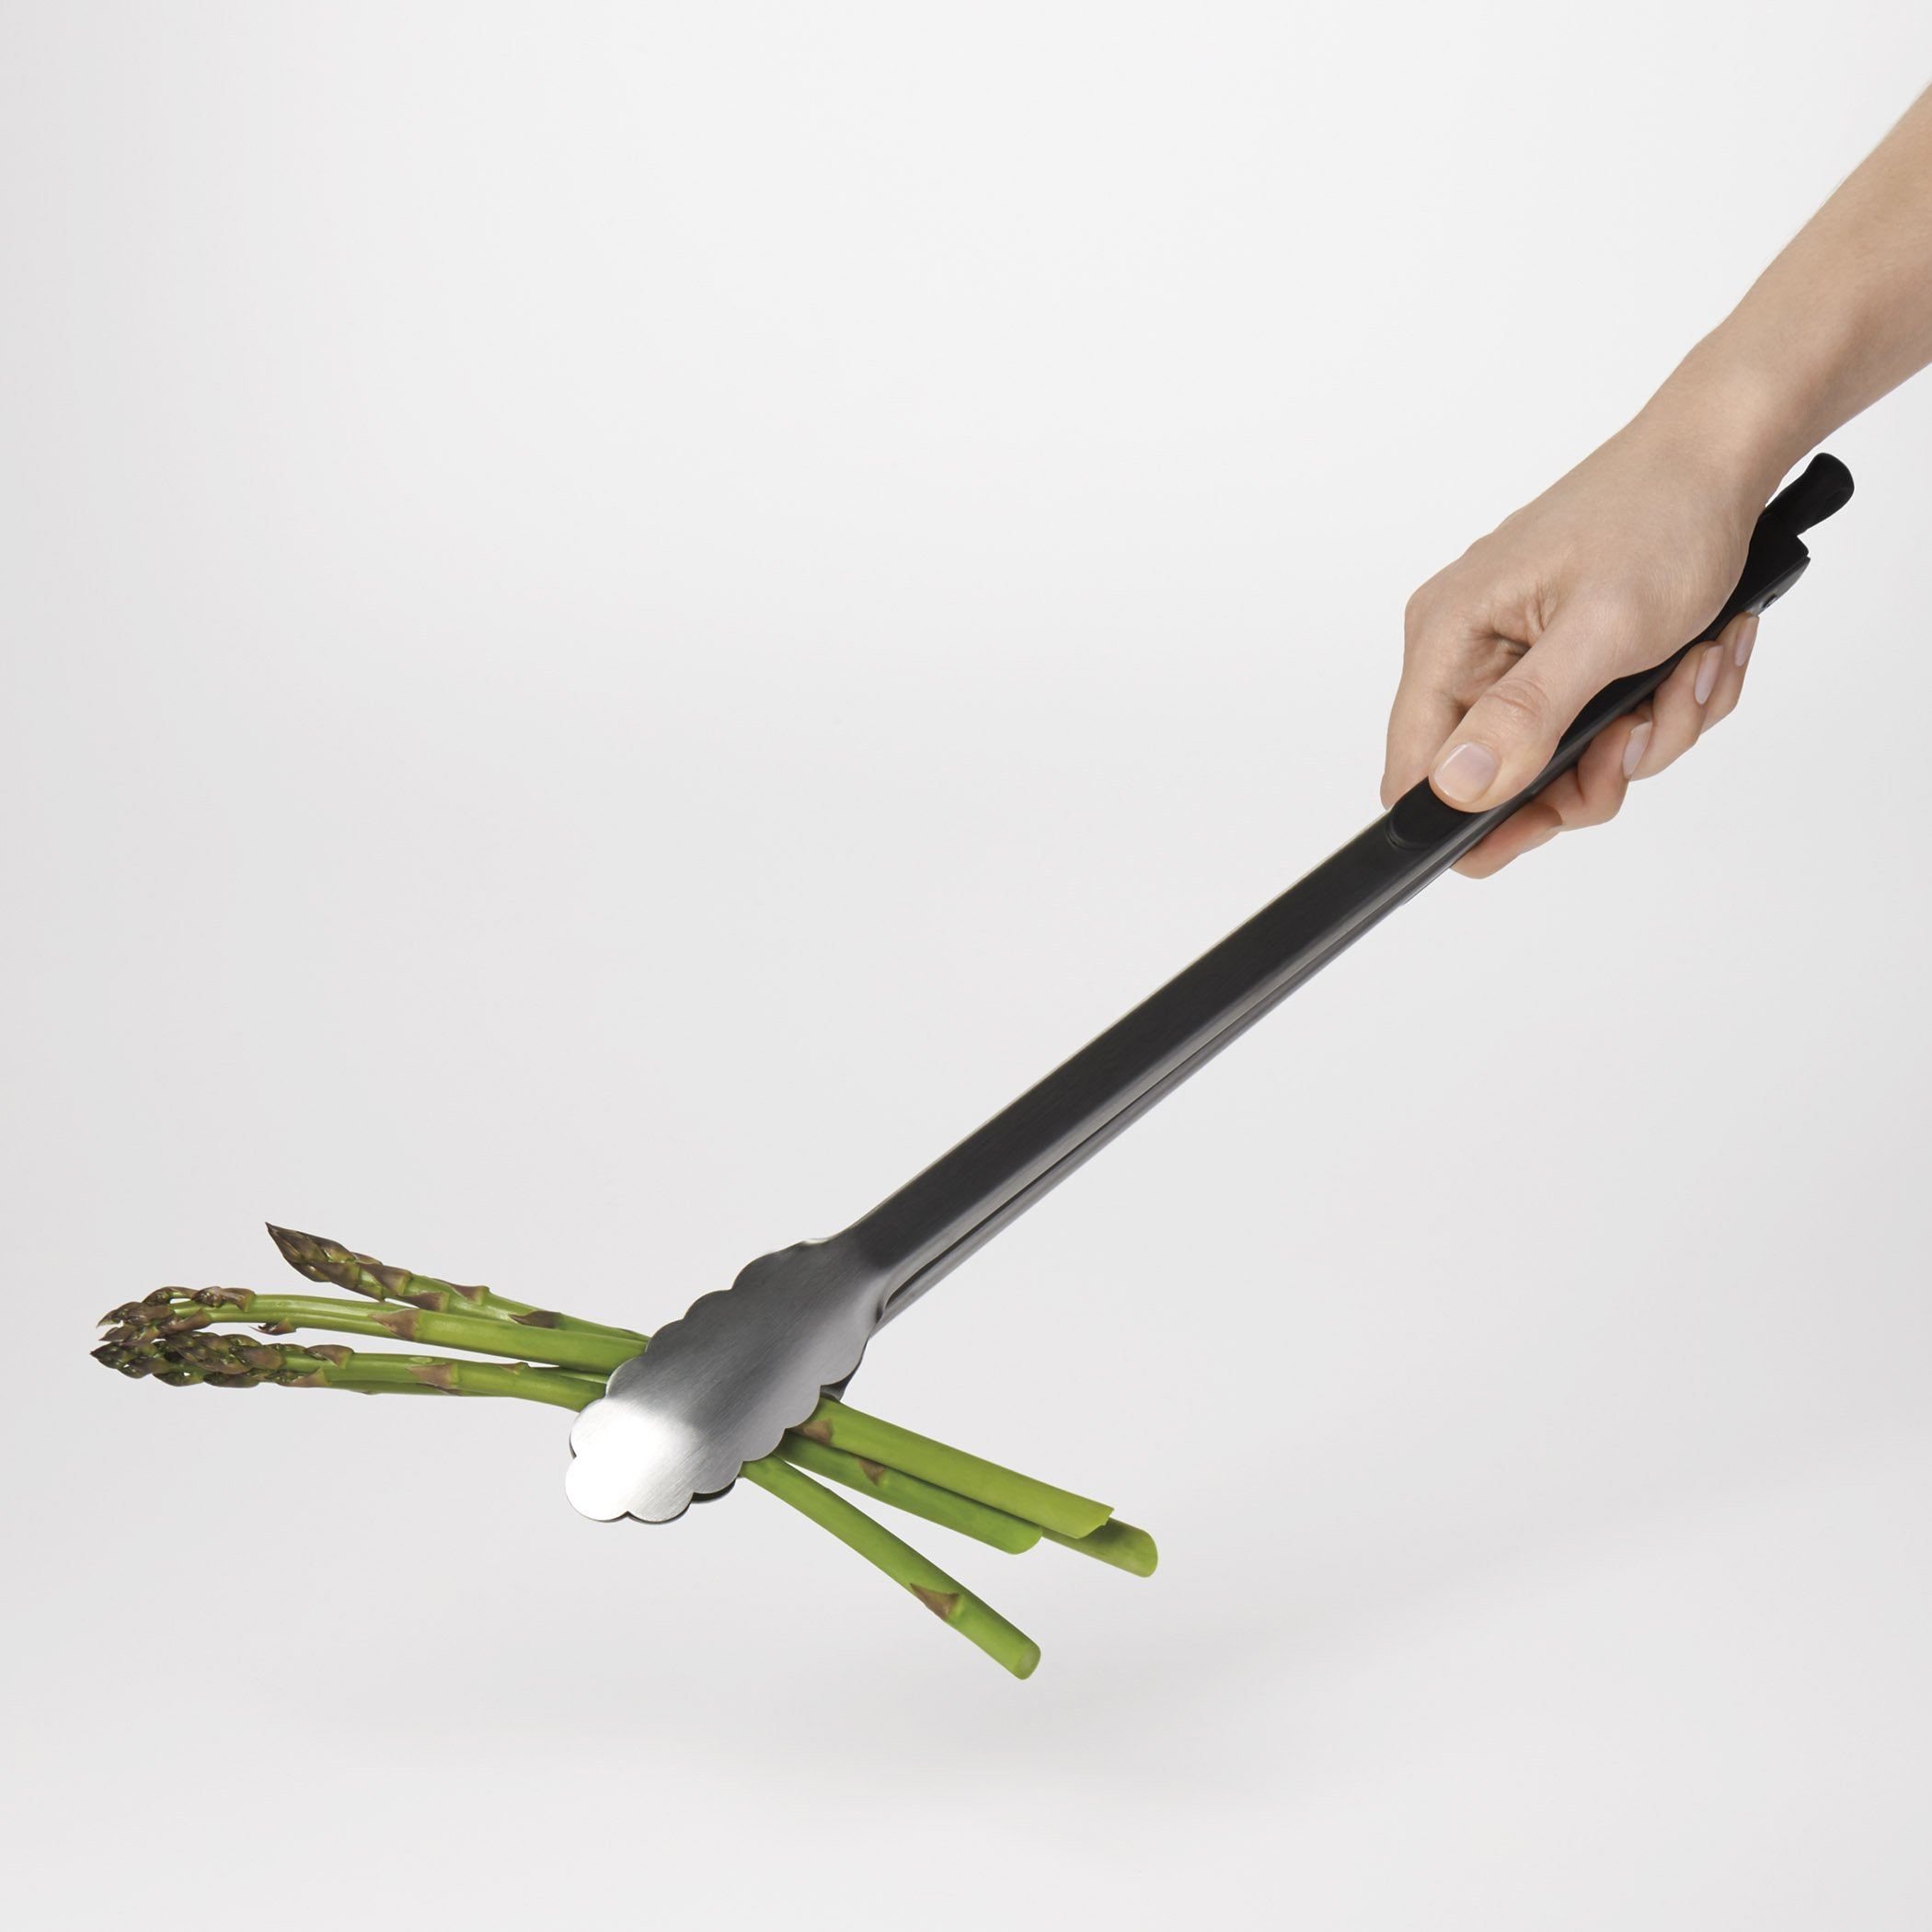 OXO Good Grips 16-Inch Locking Tongs